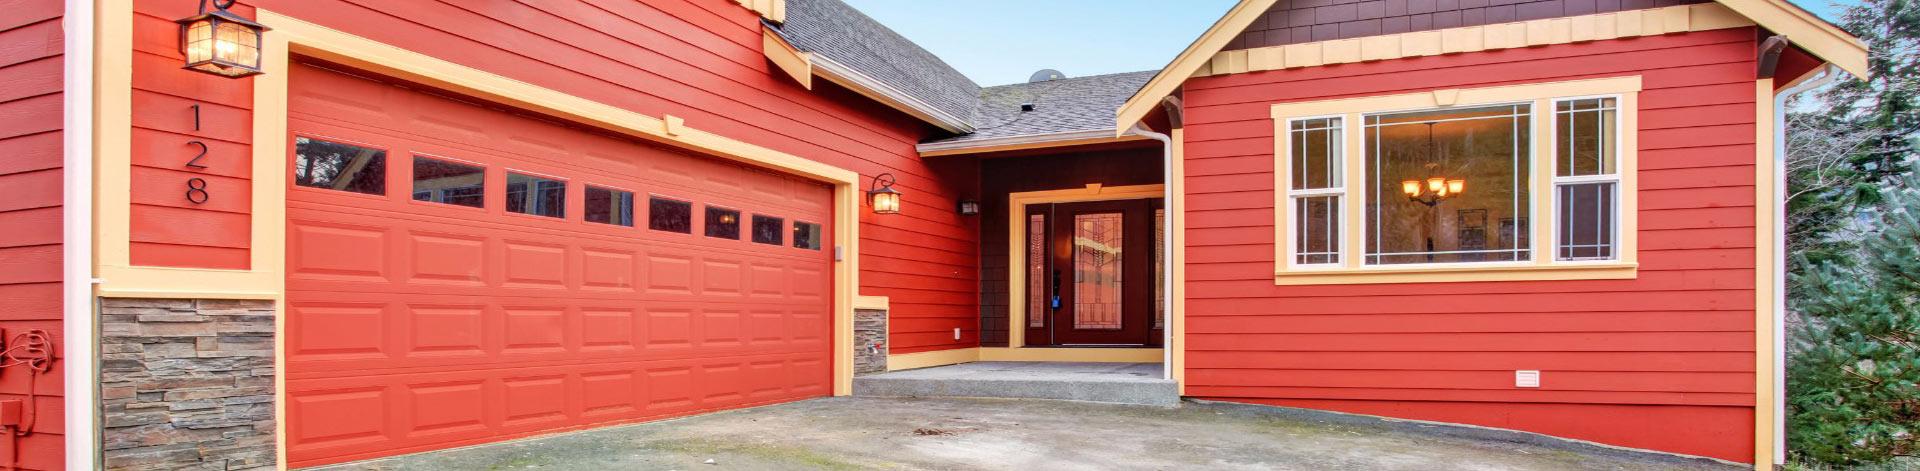 Residential garage door in brooklyn ny residential garage door brooklyn rubansaba